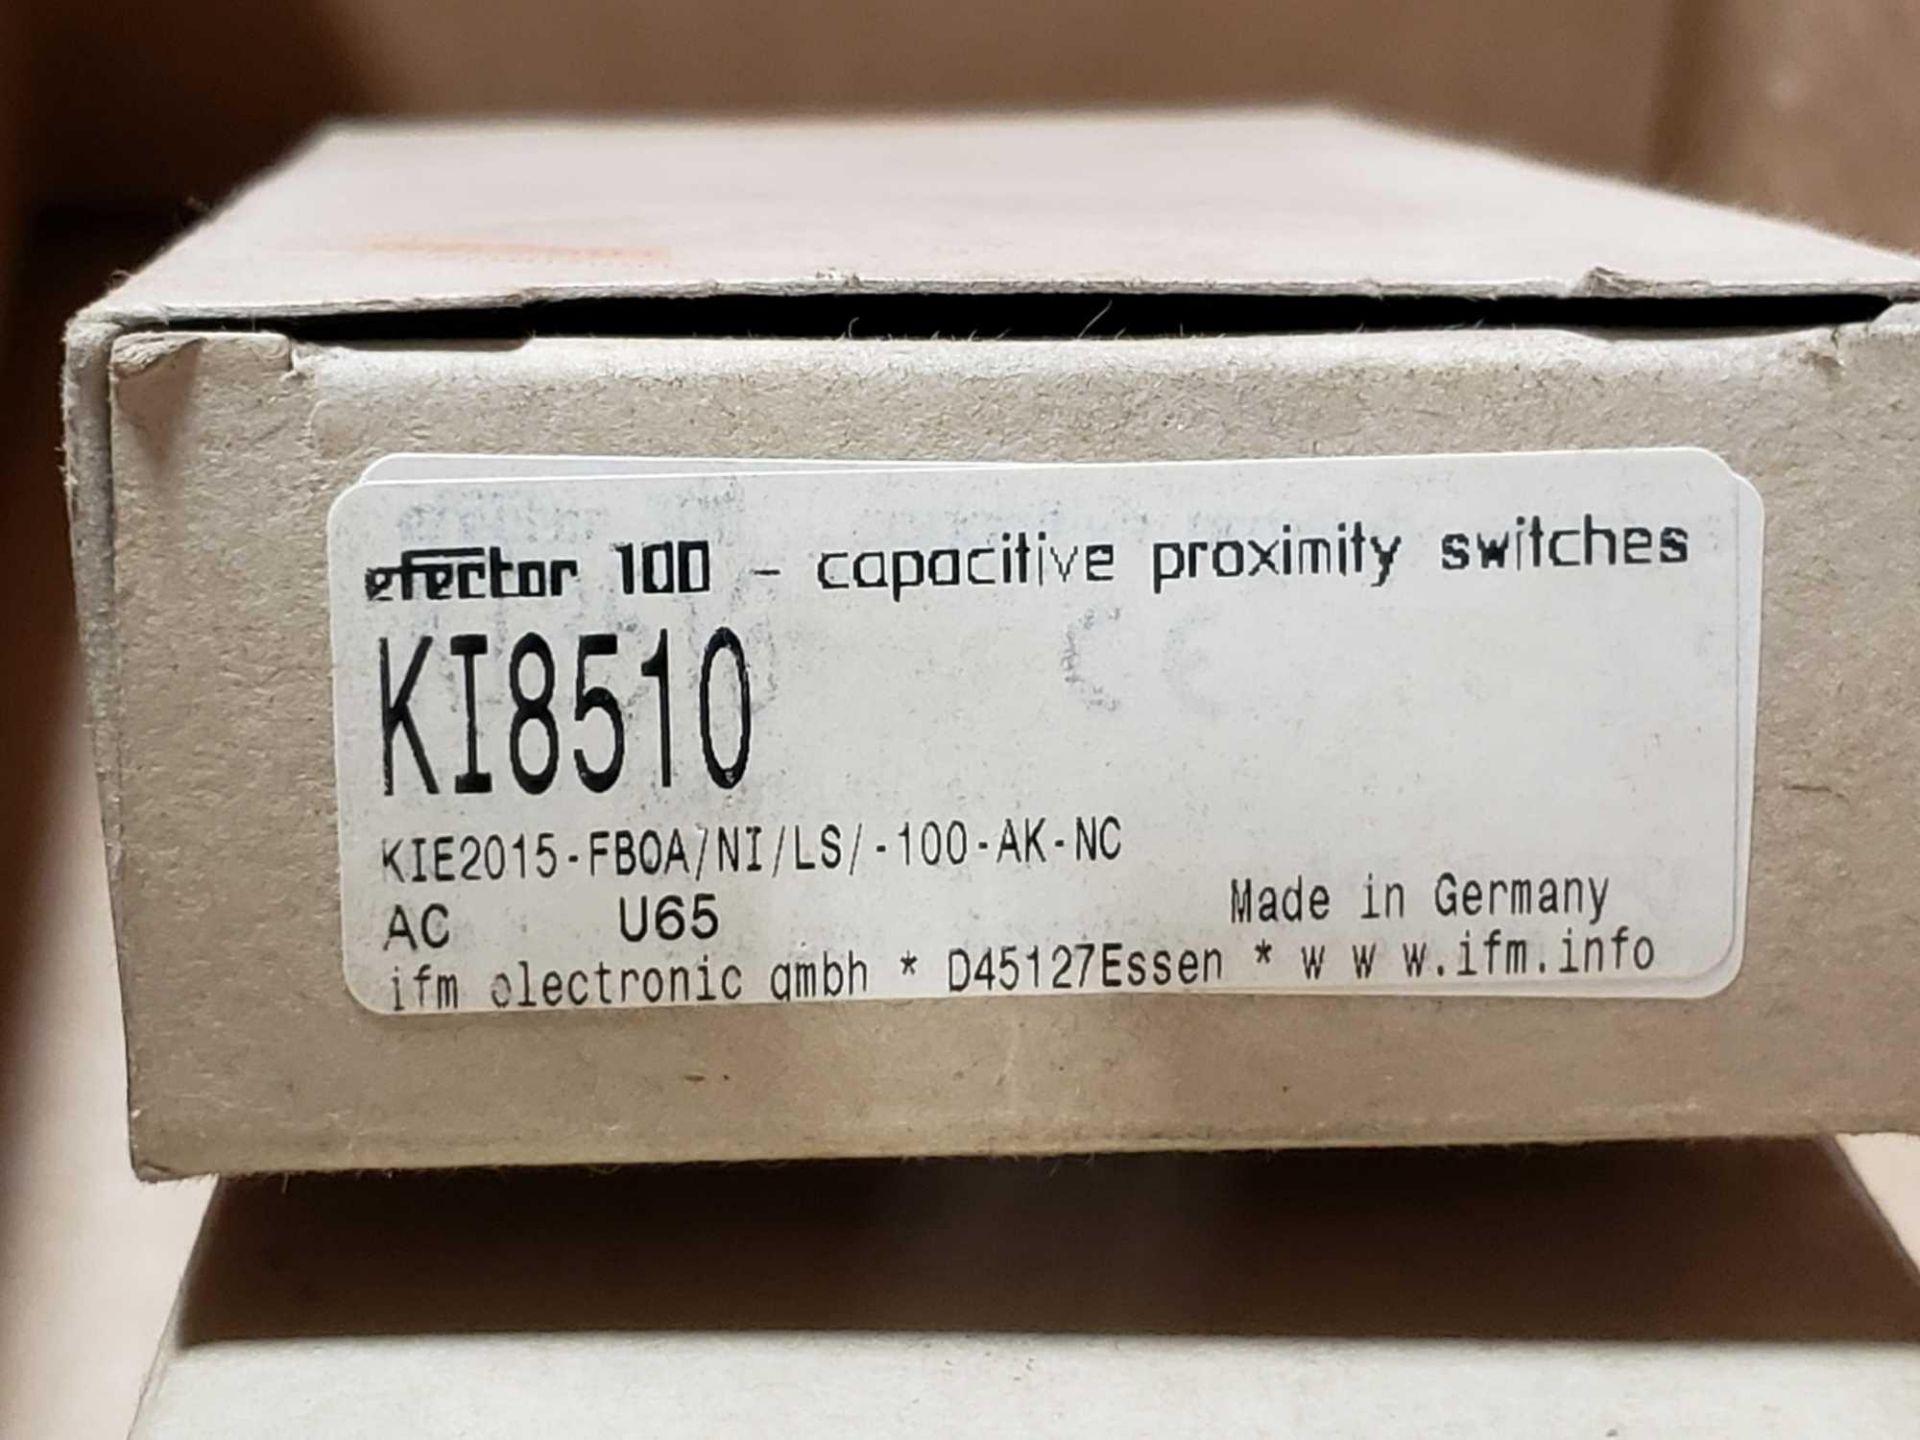 Lot 44 - Qty 2 - Efector proximity switch model KI8510. New in box.